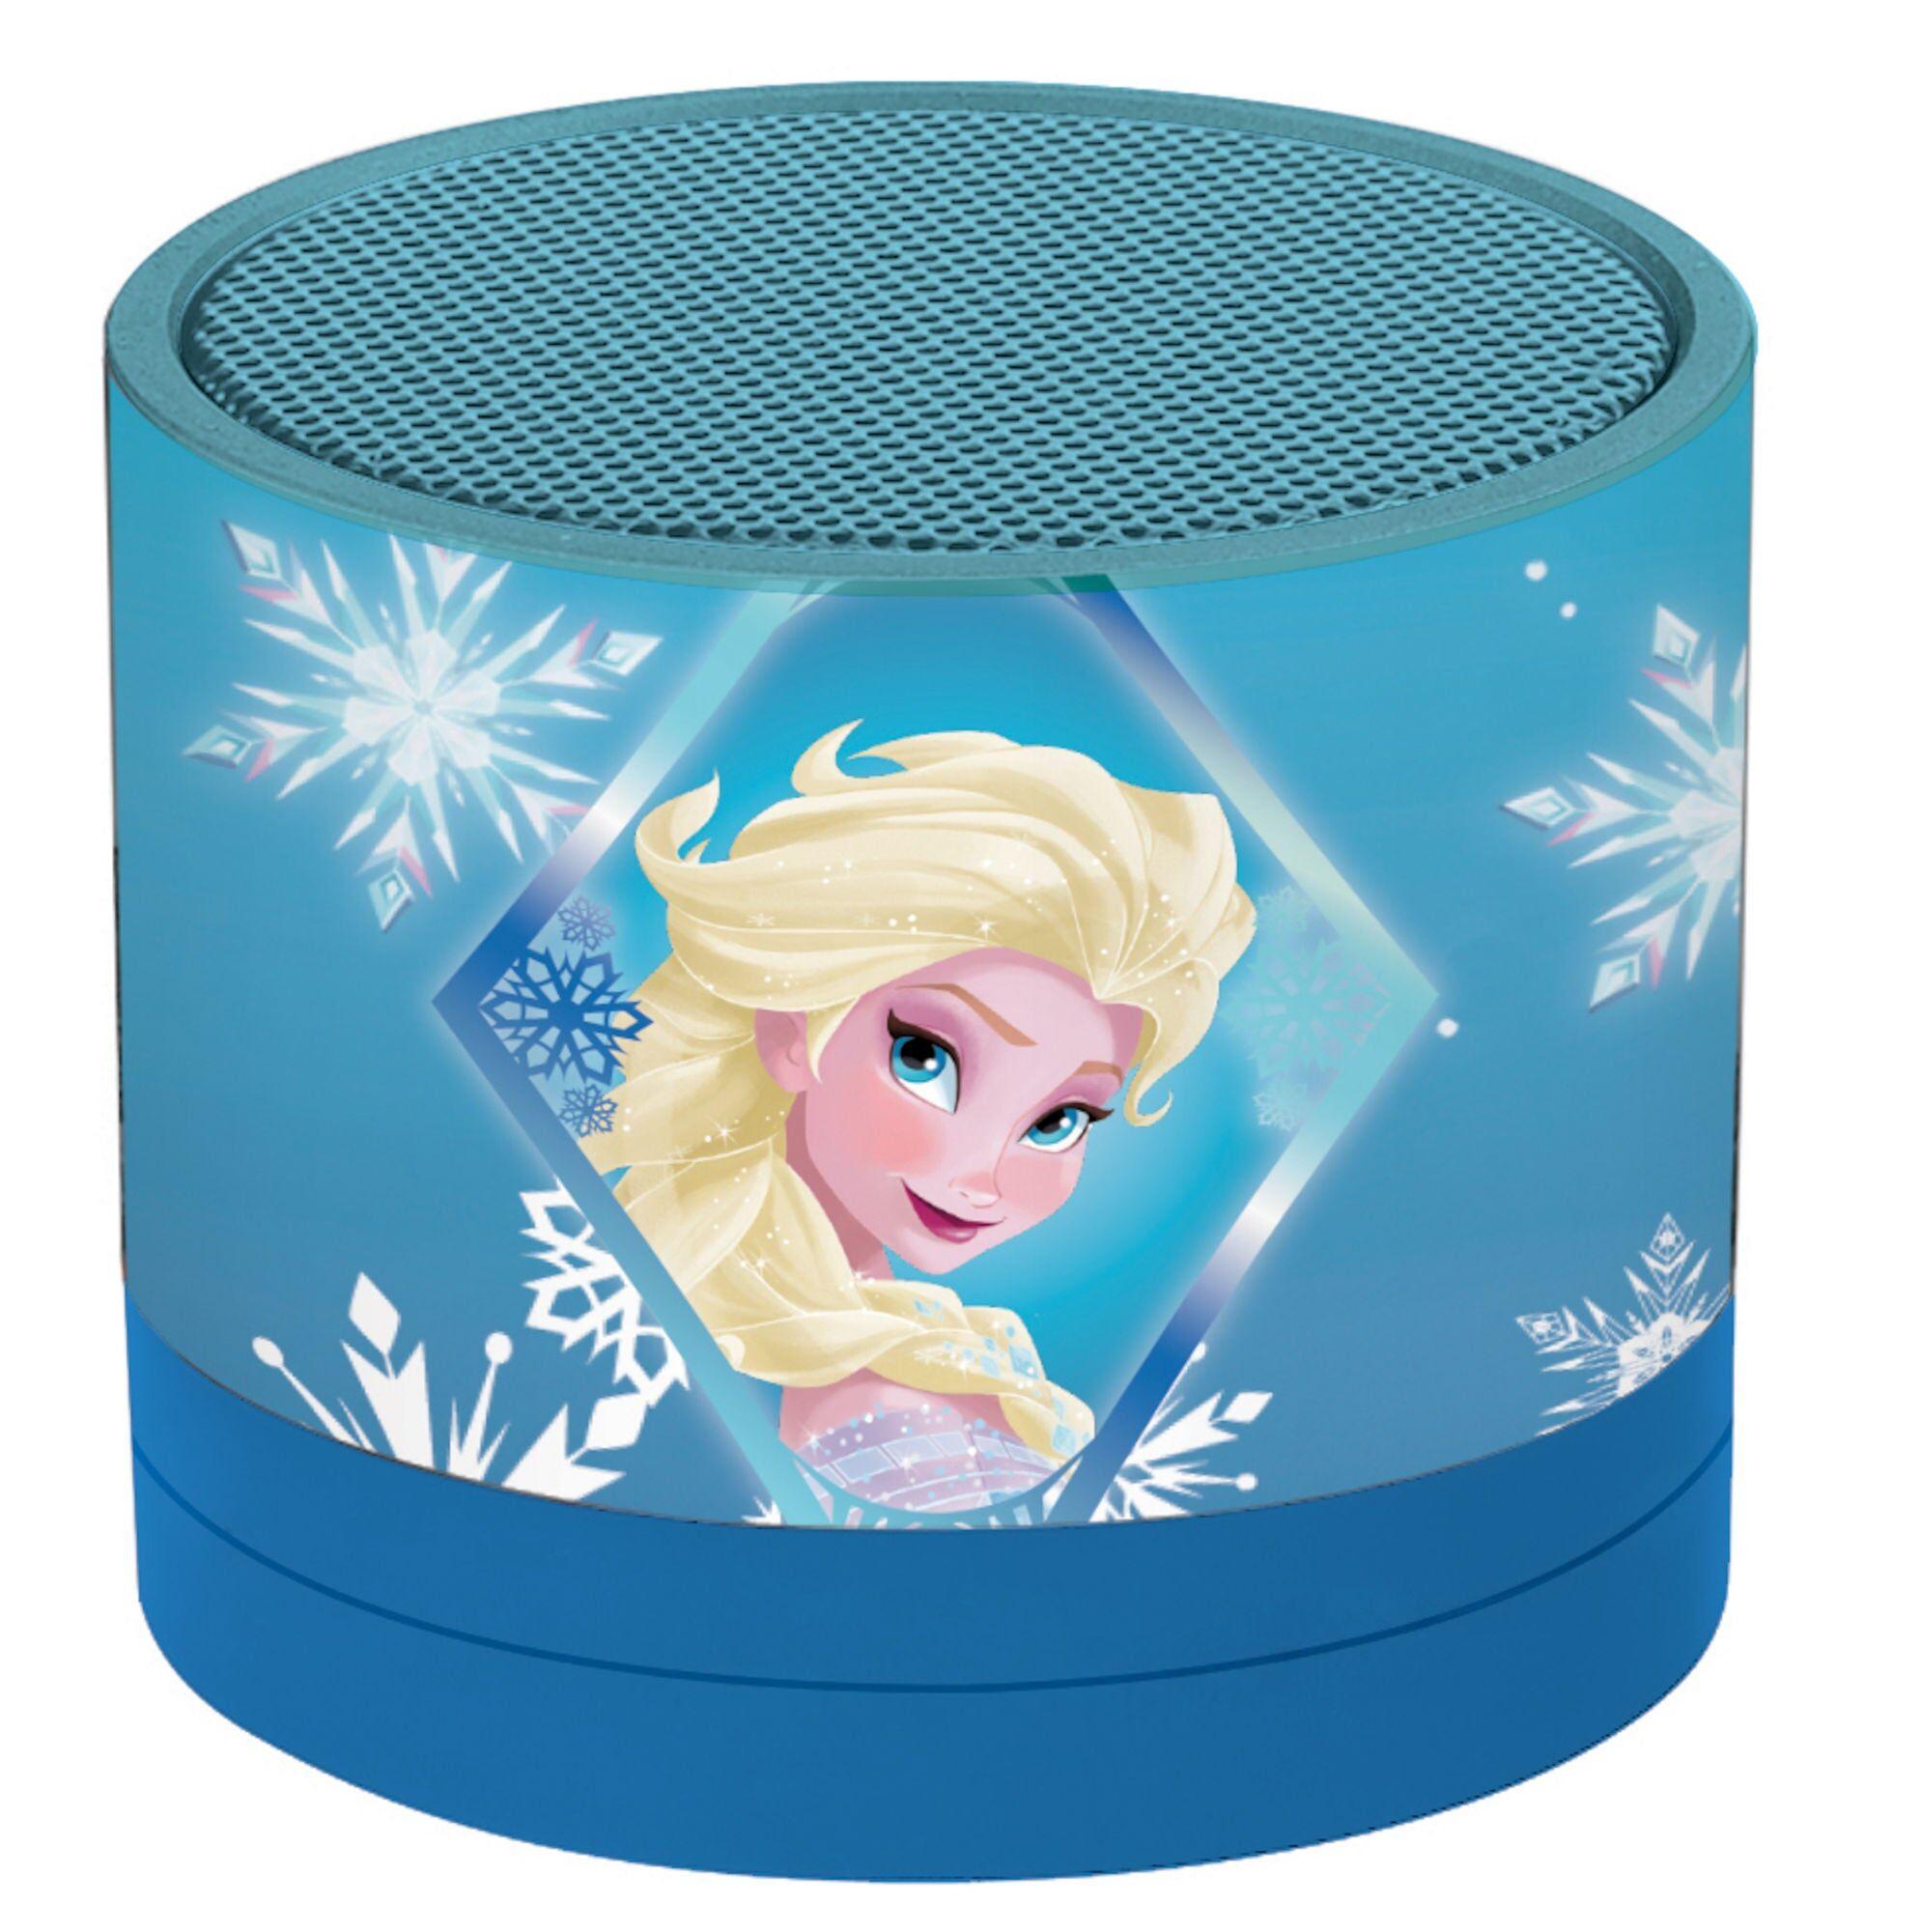 Disney Frozen Høytaler Bluetooth, Blå